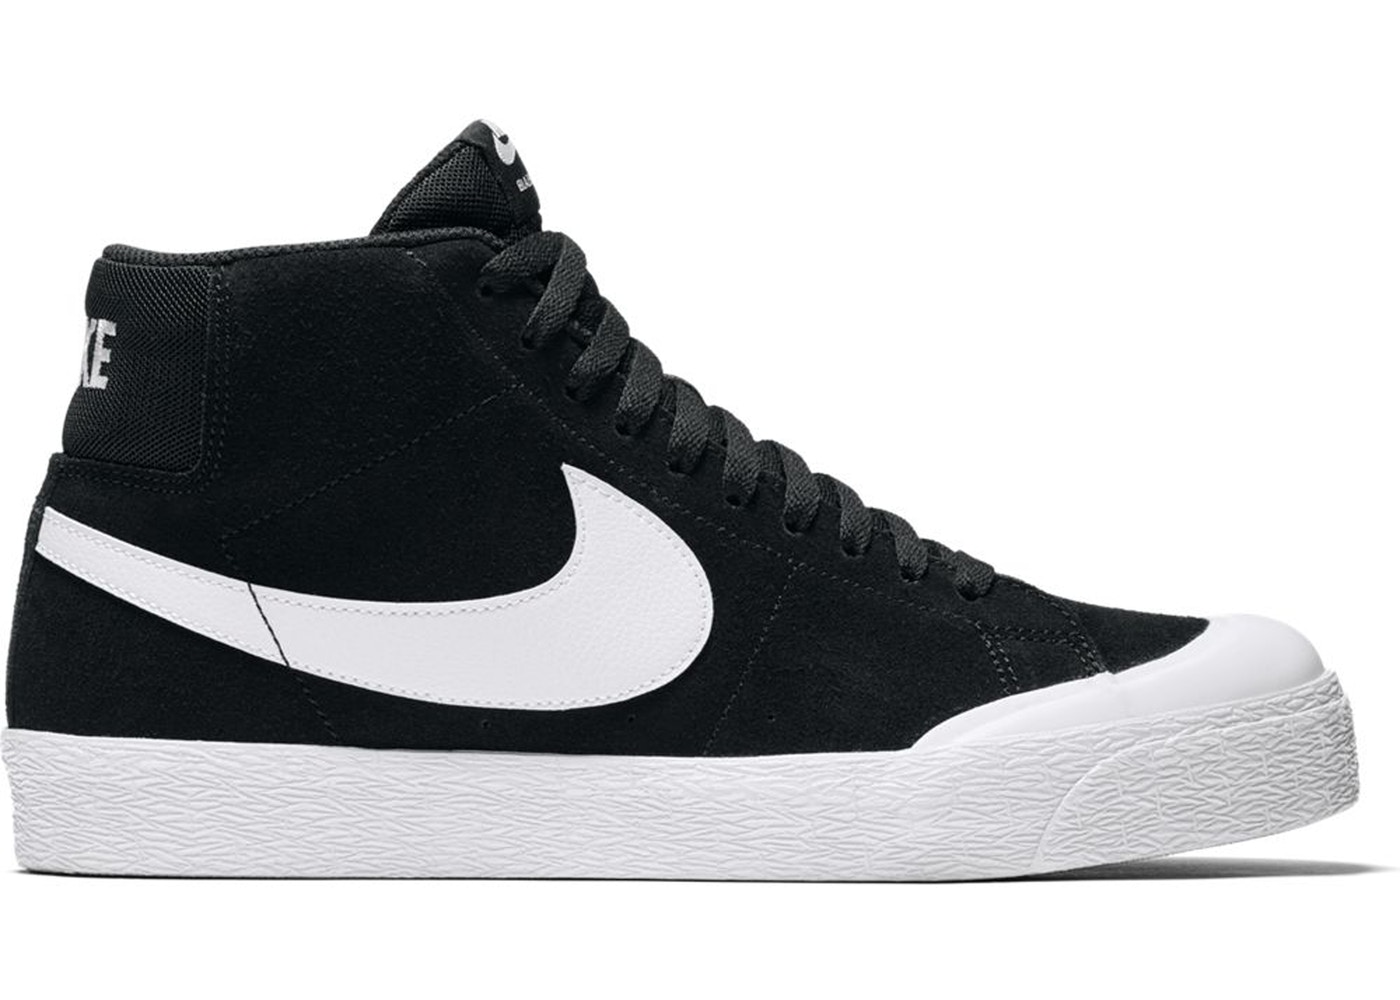 Nike SB Zoom Blazer Mid XT Black White Gum - 876872-019